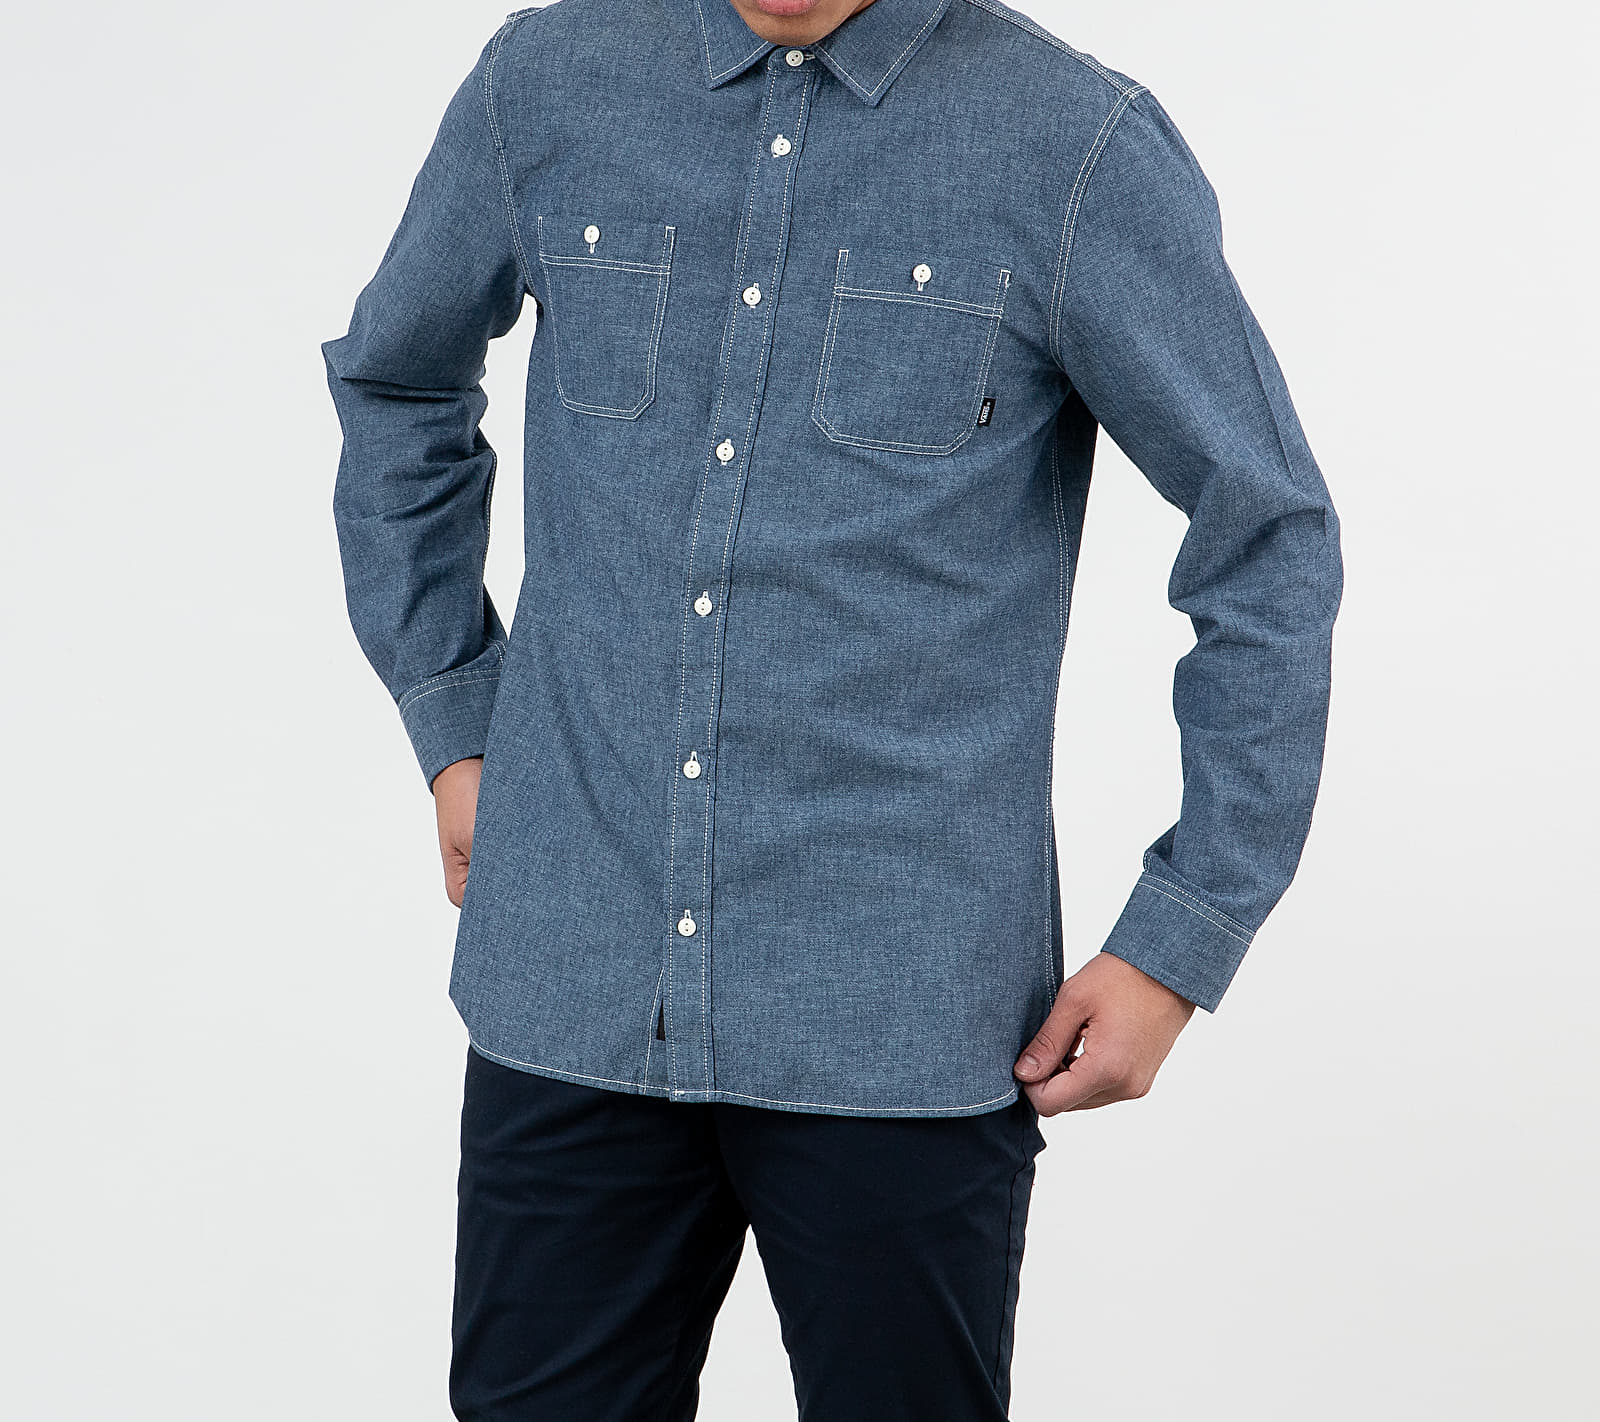 Vans Carlow Longsleeve II Shirt Dress Blues, Blue